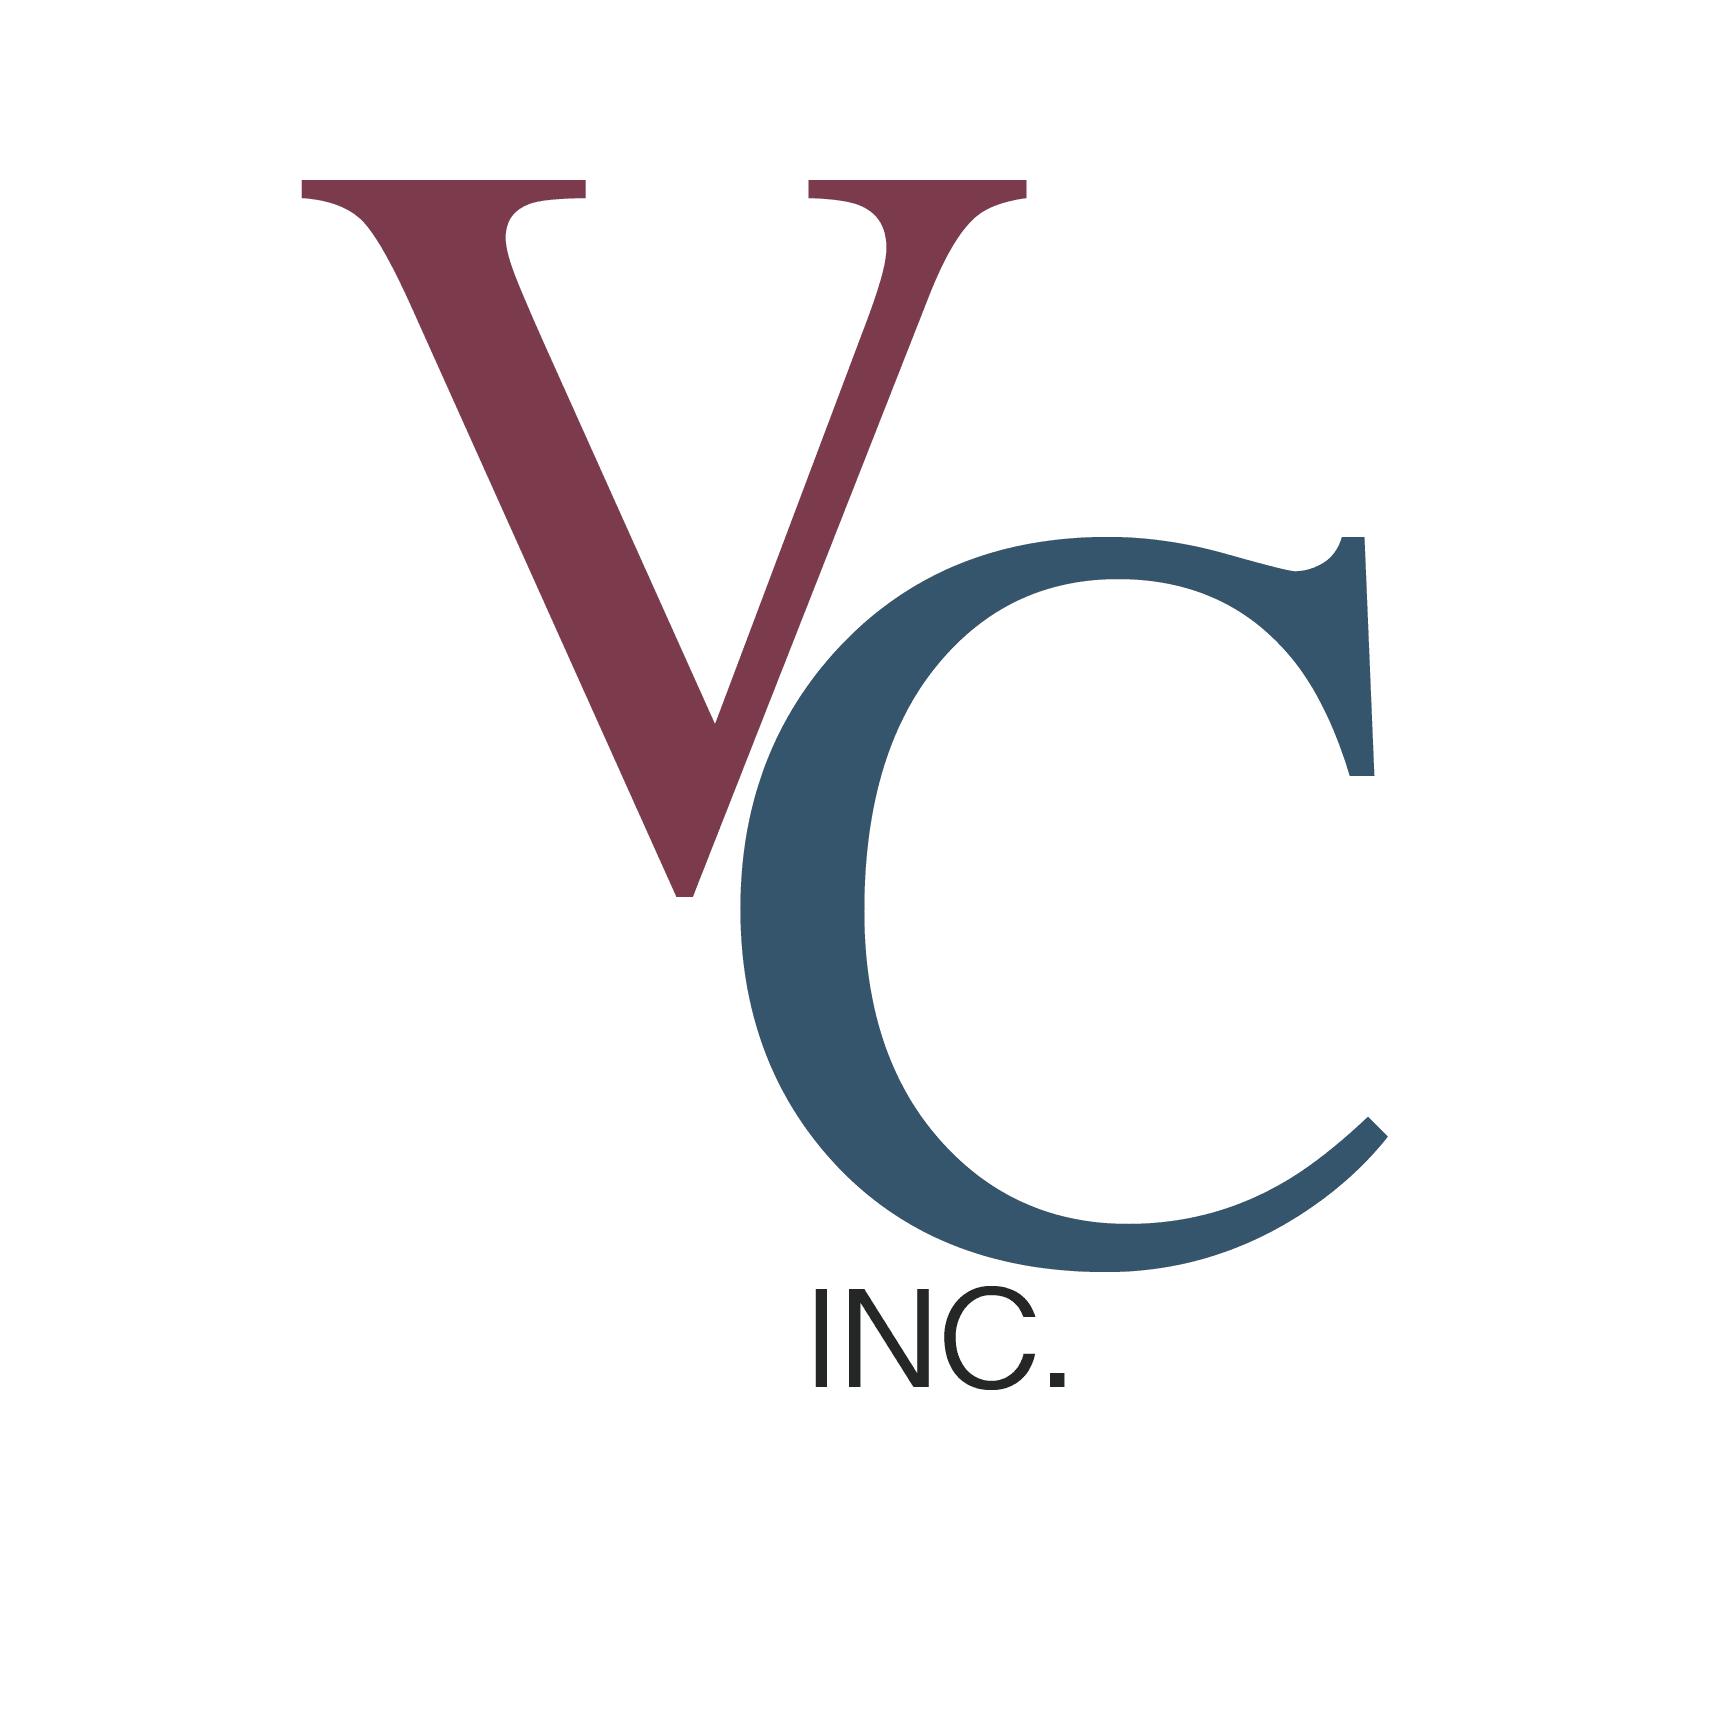 Villatoro & M Construction Inc